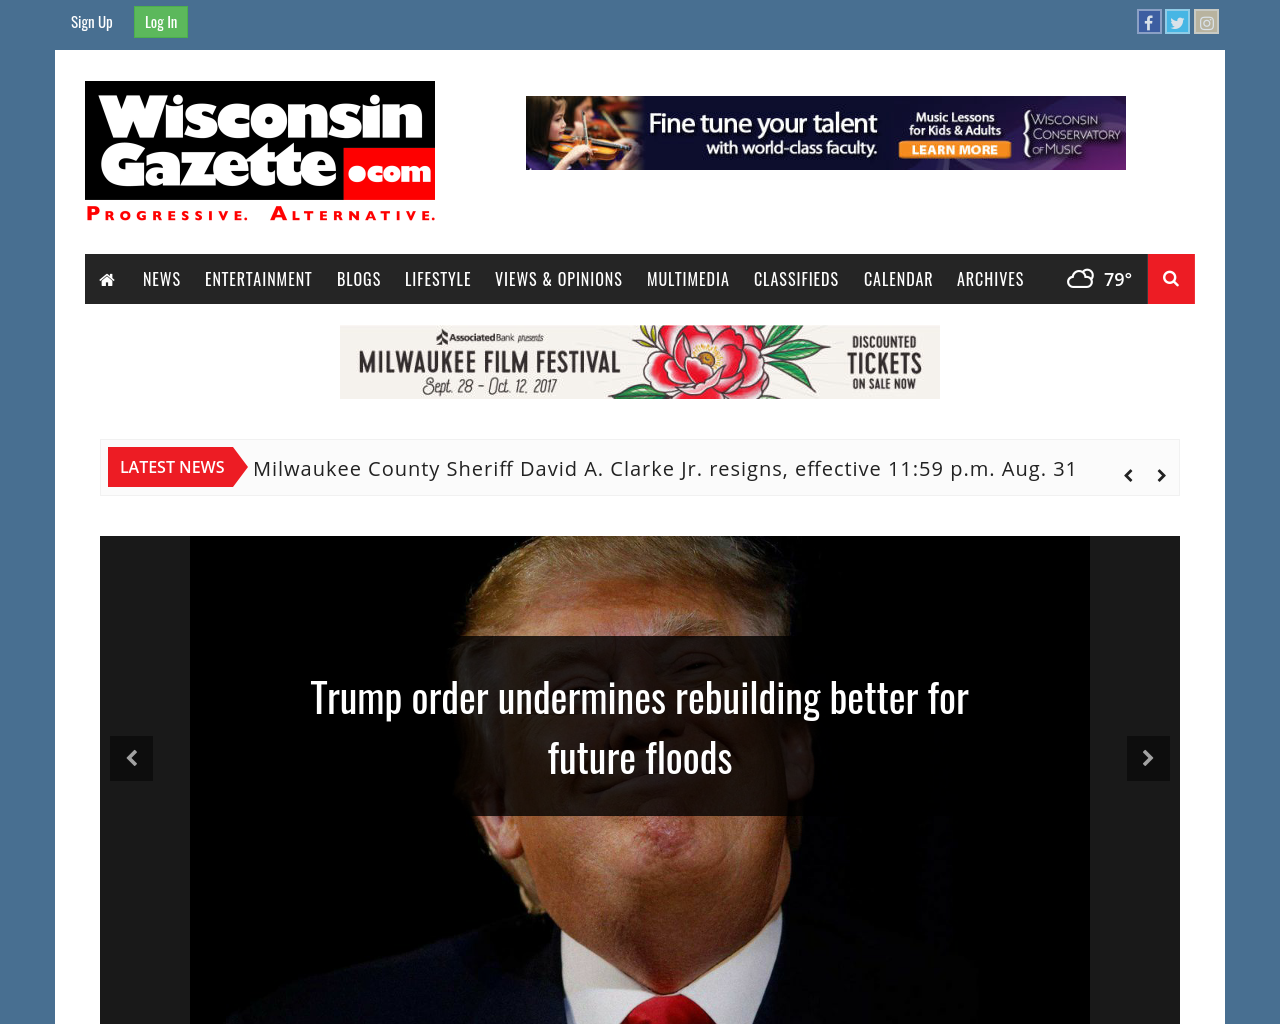 Wisconsin-Gazzete-Advertising-Reviews-Pricing